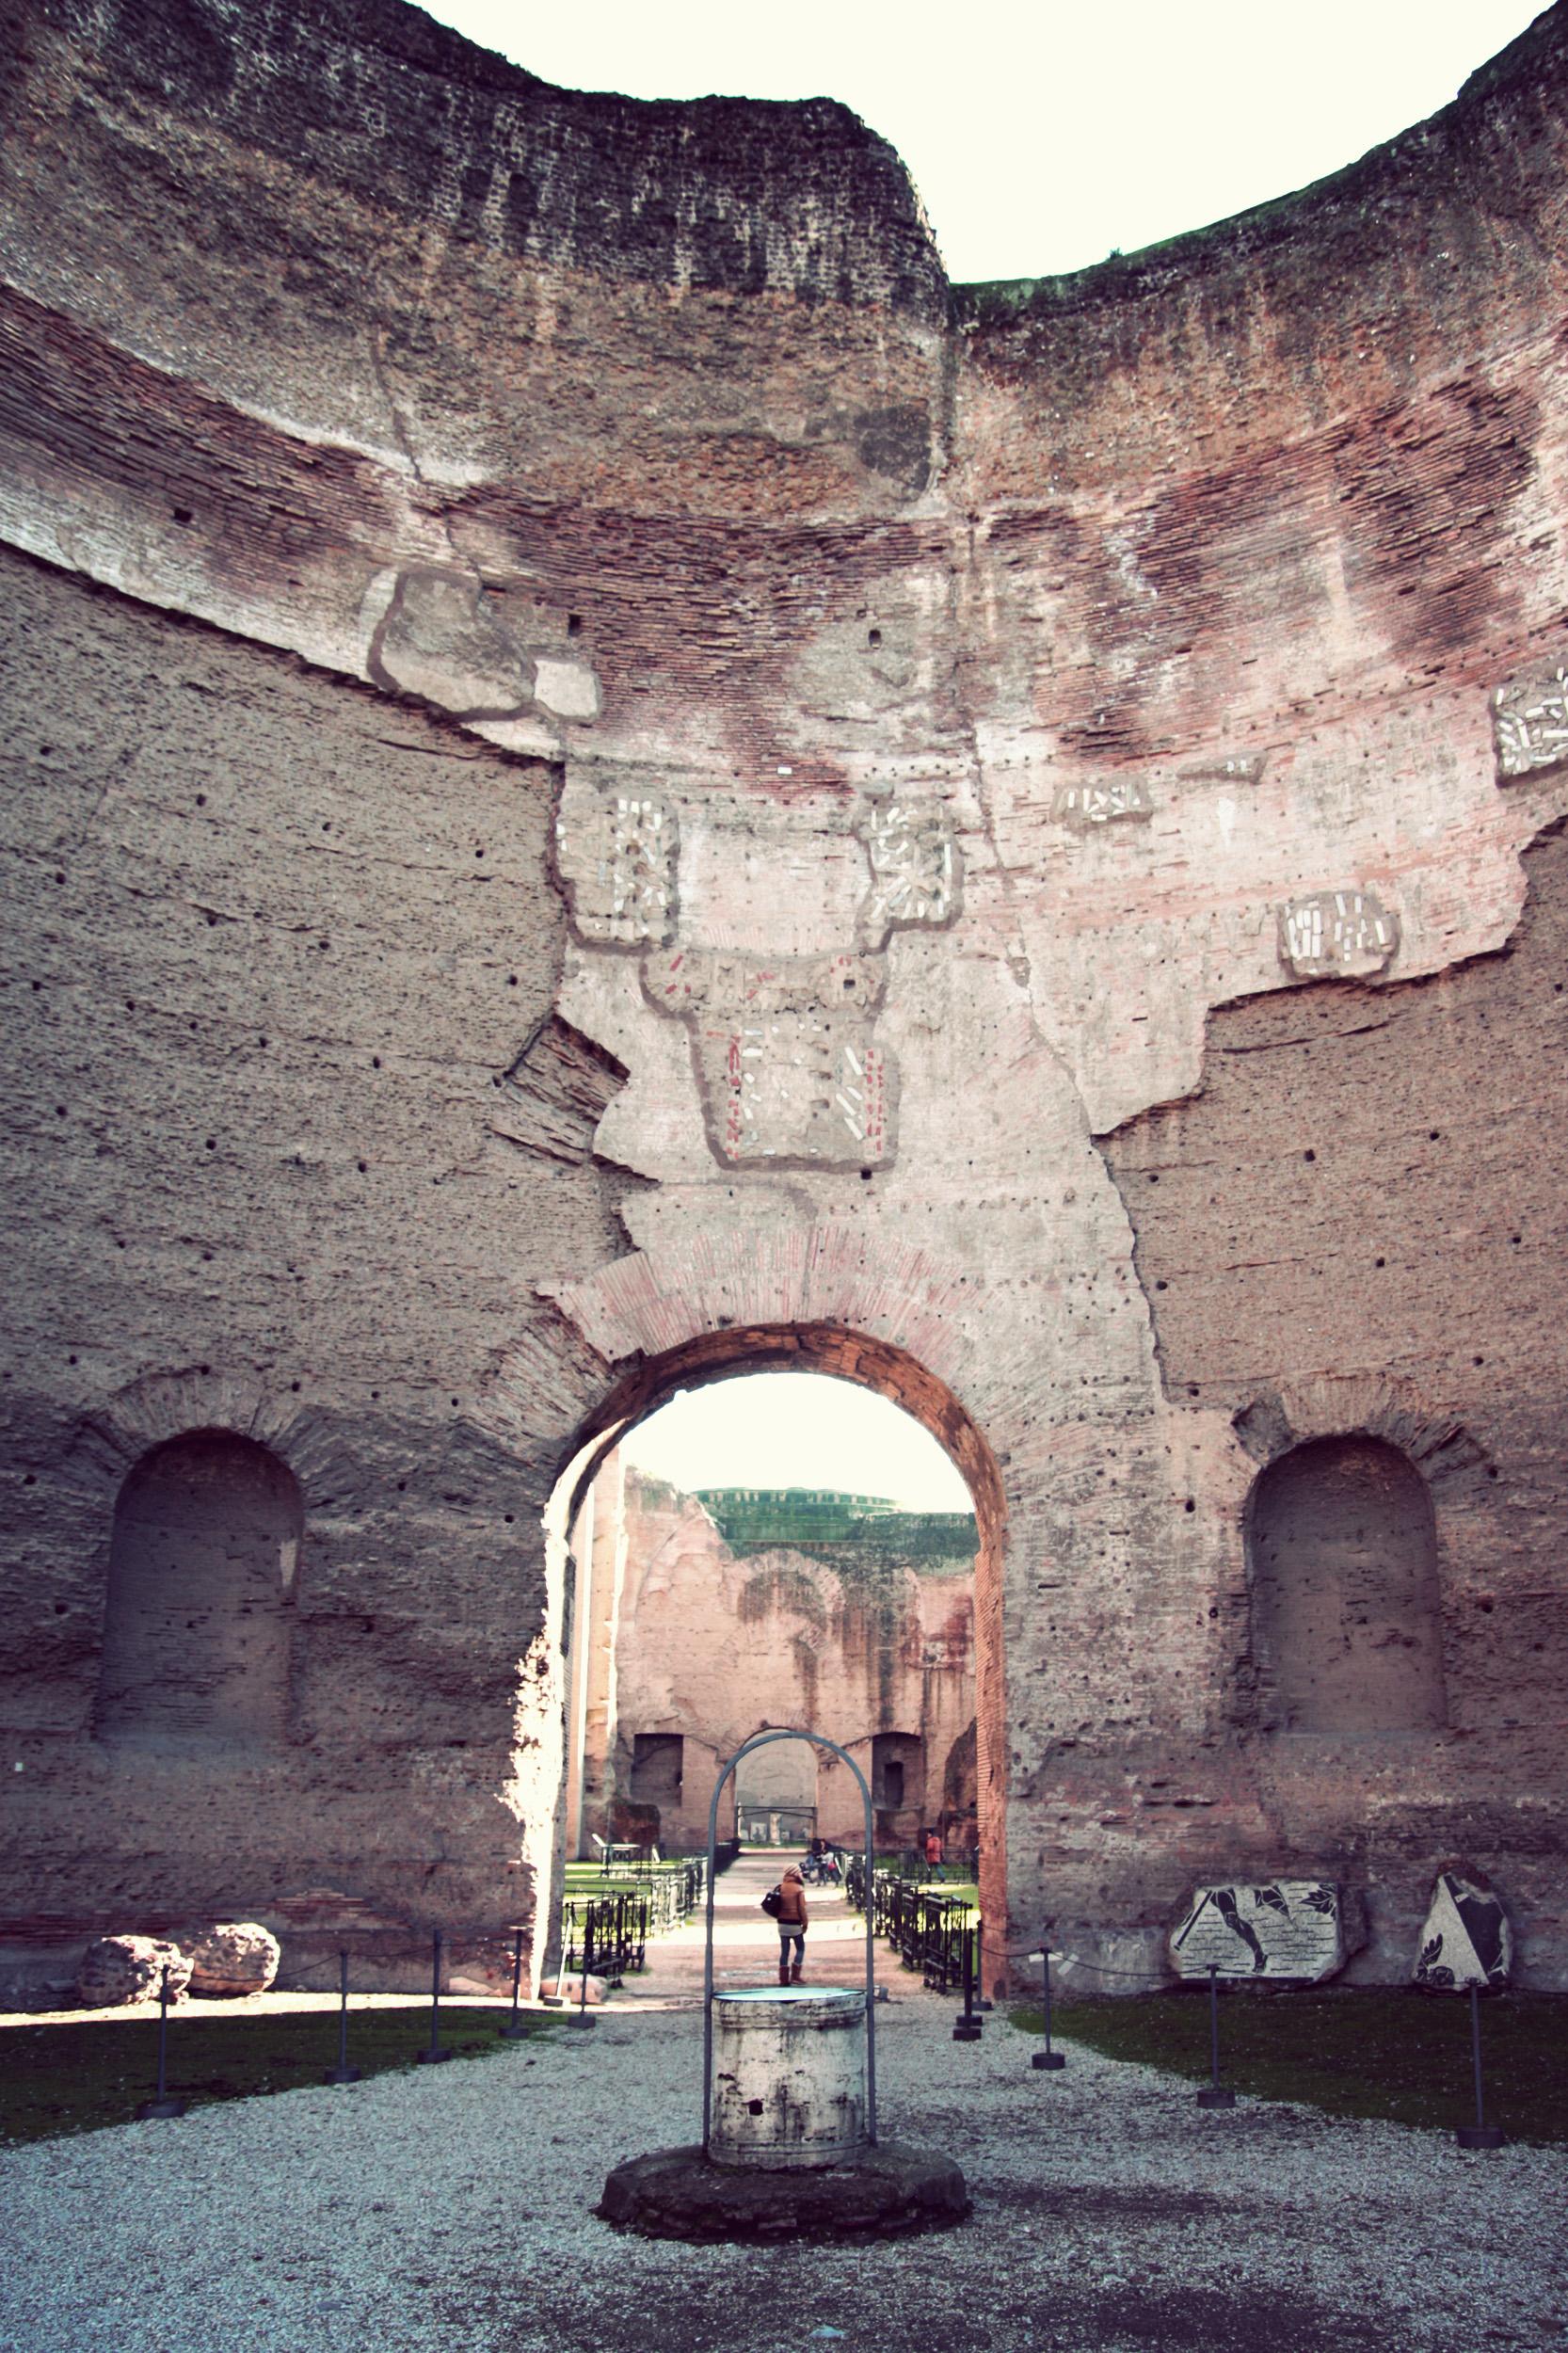 Baths-of-Caracalla_05.jpg